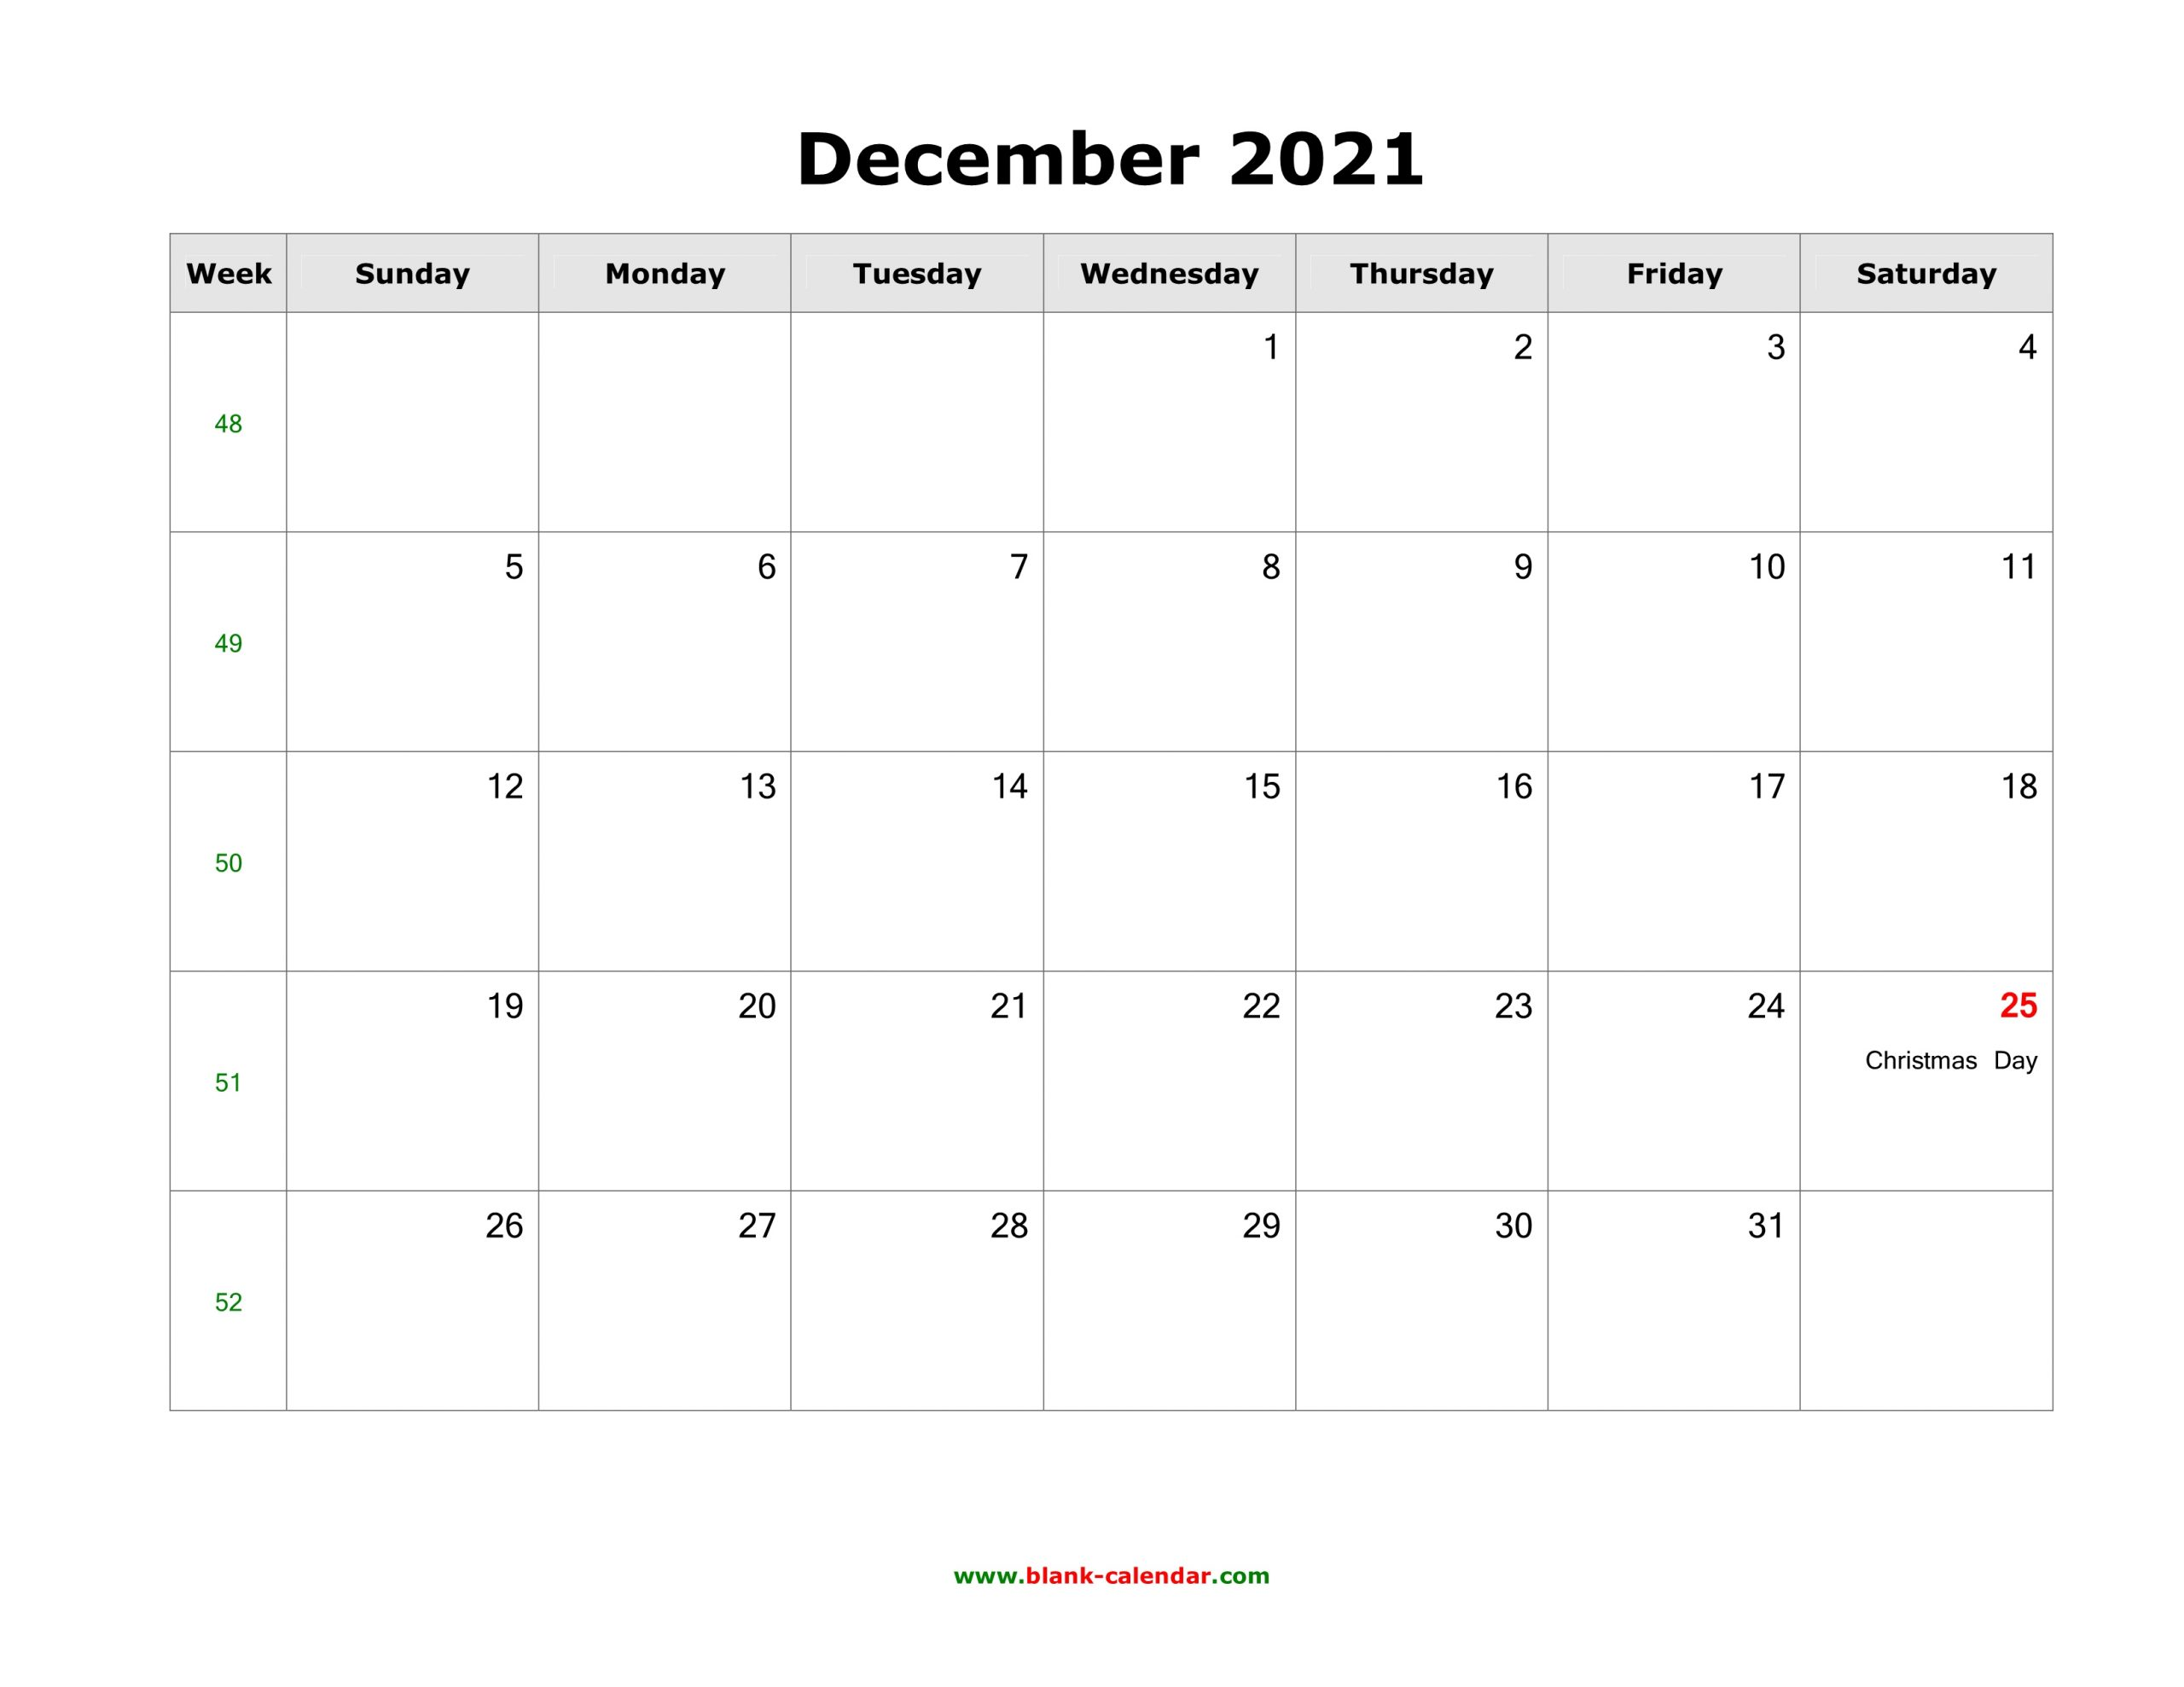 December 2021 Calendar With Holidays Usa   Printable March December Calendar Of 2021